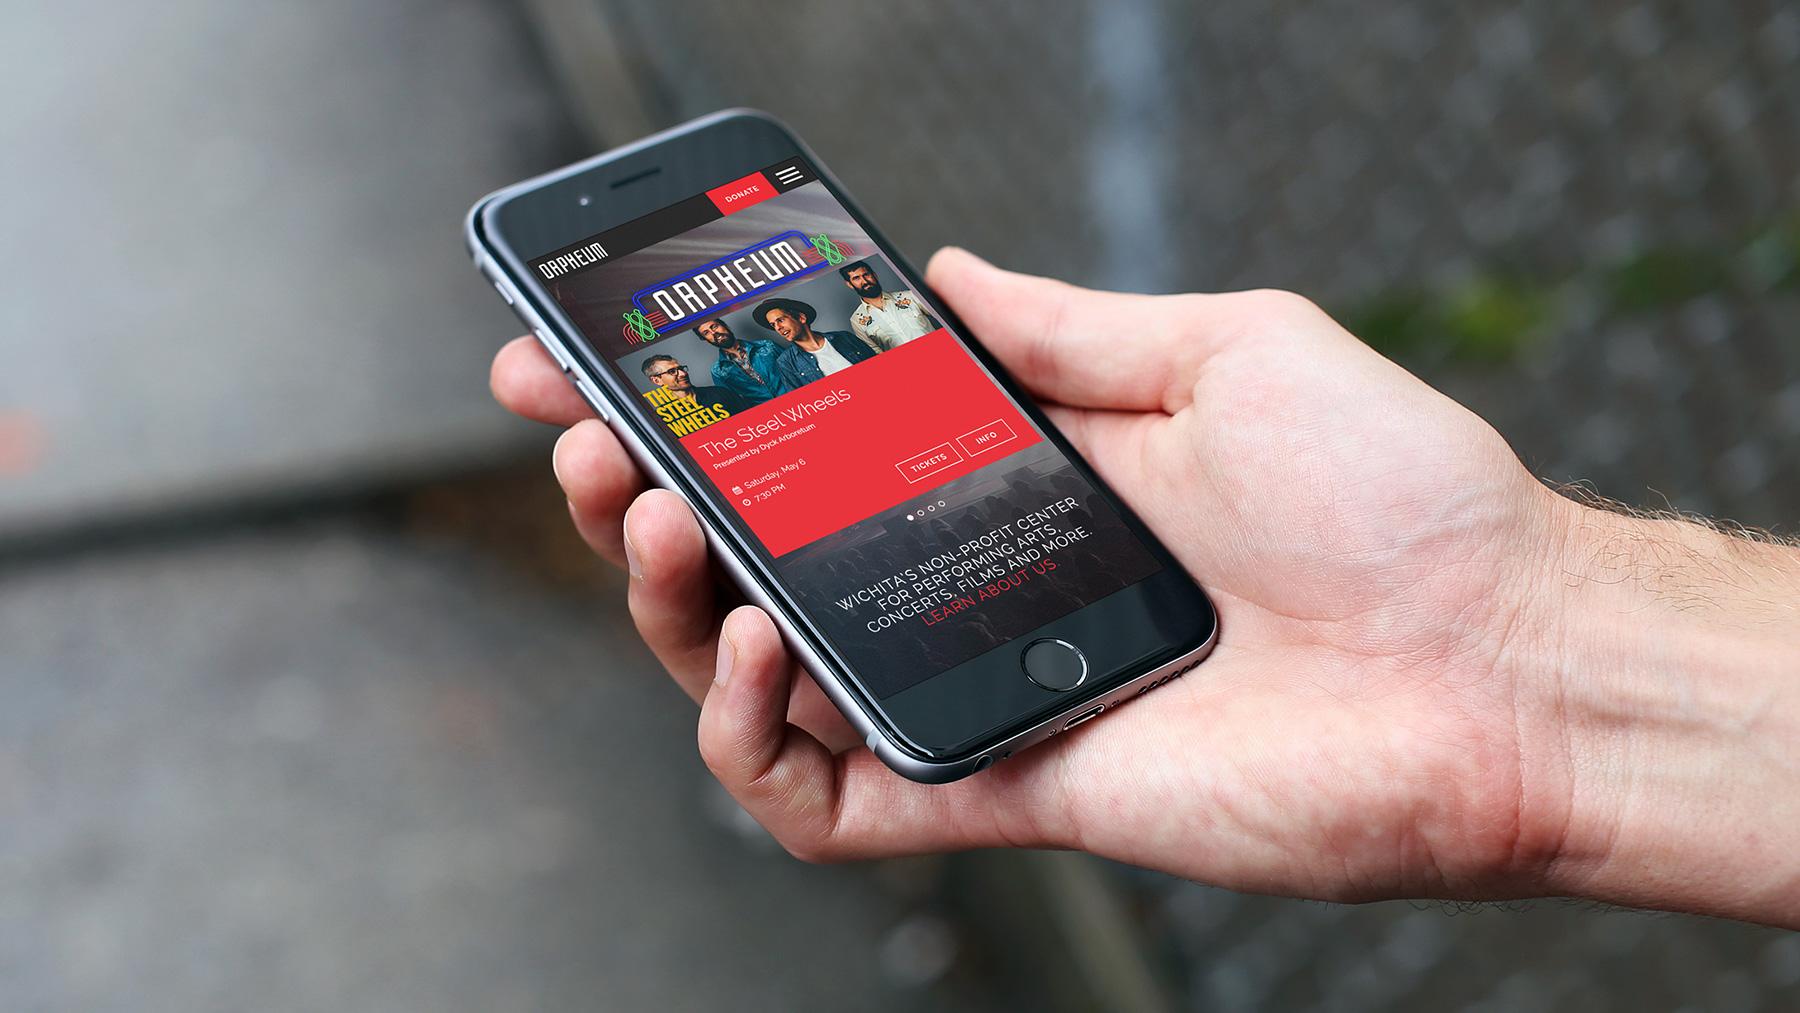 Orpheum theater website on iphone